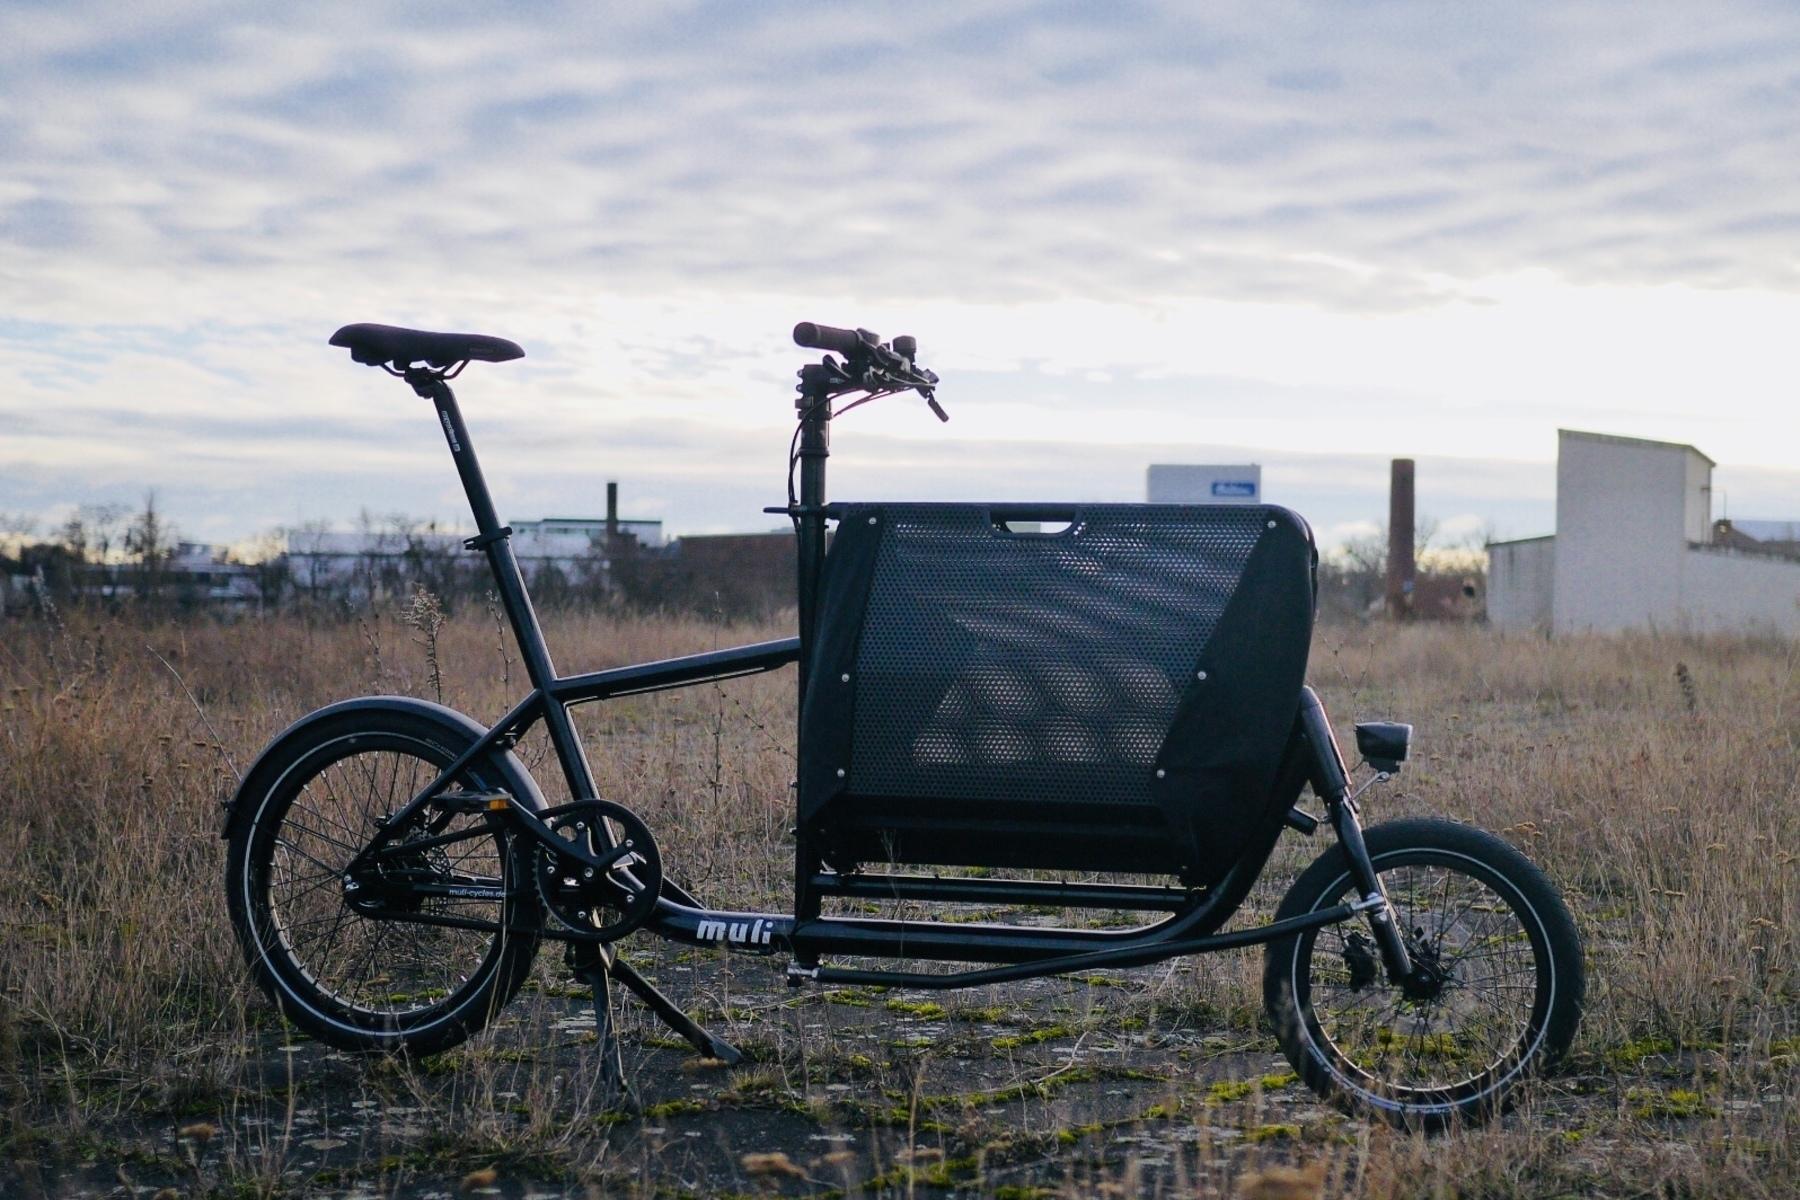 miete das muli lastenrad mit listnride. Black Bedroom Furniture Sets. Home Design Ideas